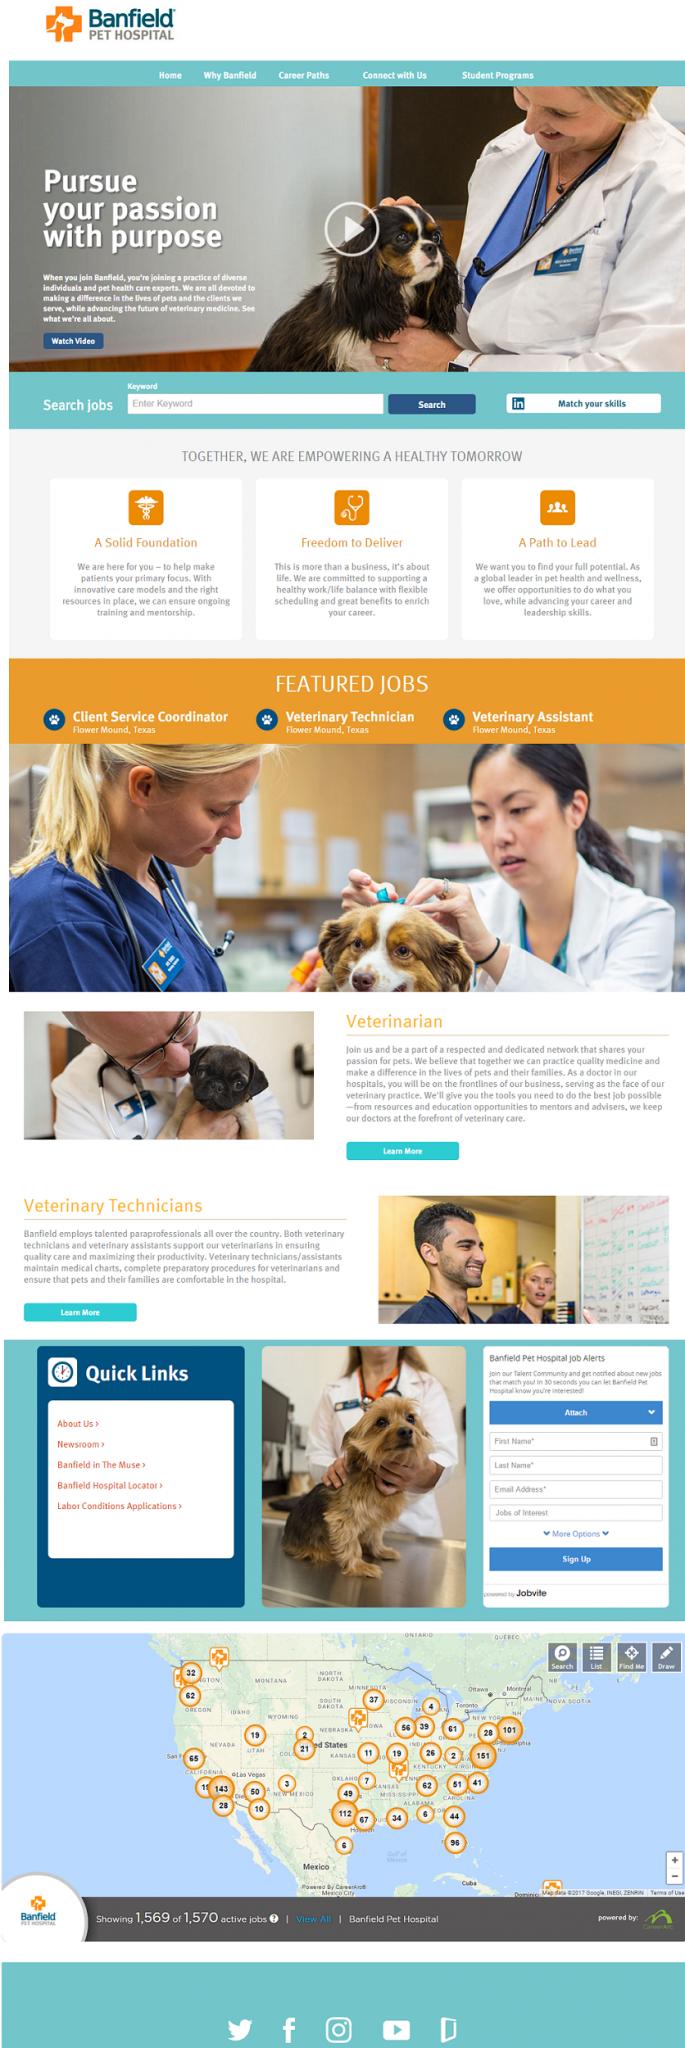 Best Company Career Sites Banfield Pet Hospital 2 - Ongig Blog